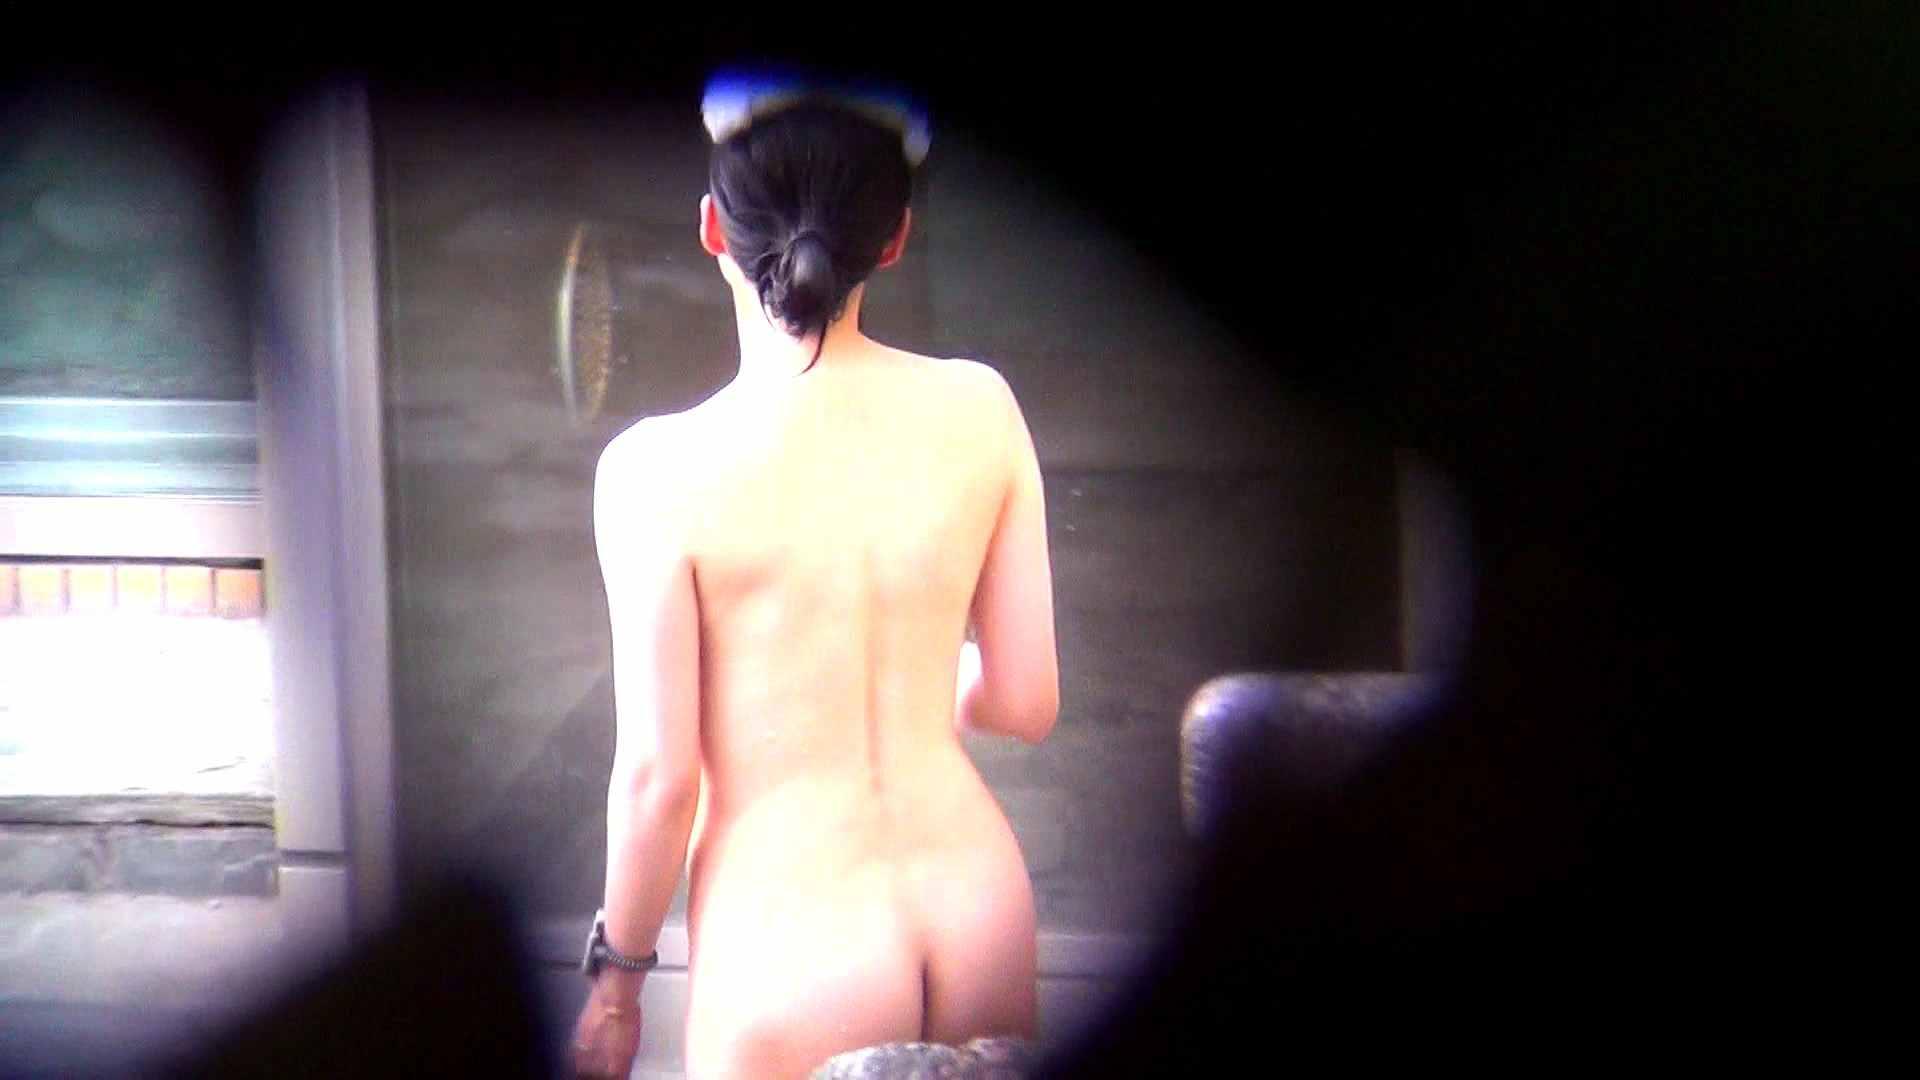 Vol.60 細身美女の股間から垂れているタコ糸 露天 エロ画像 75連発 10